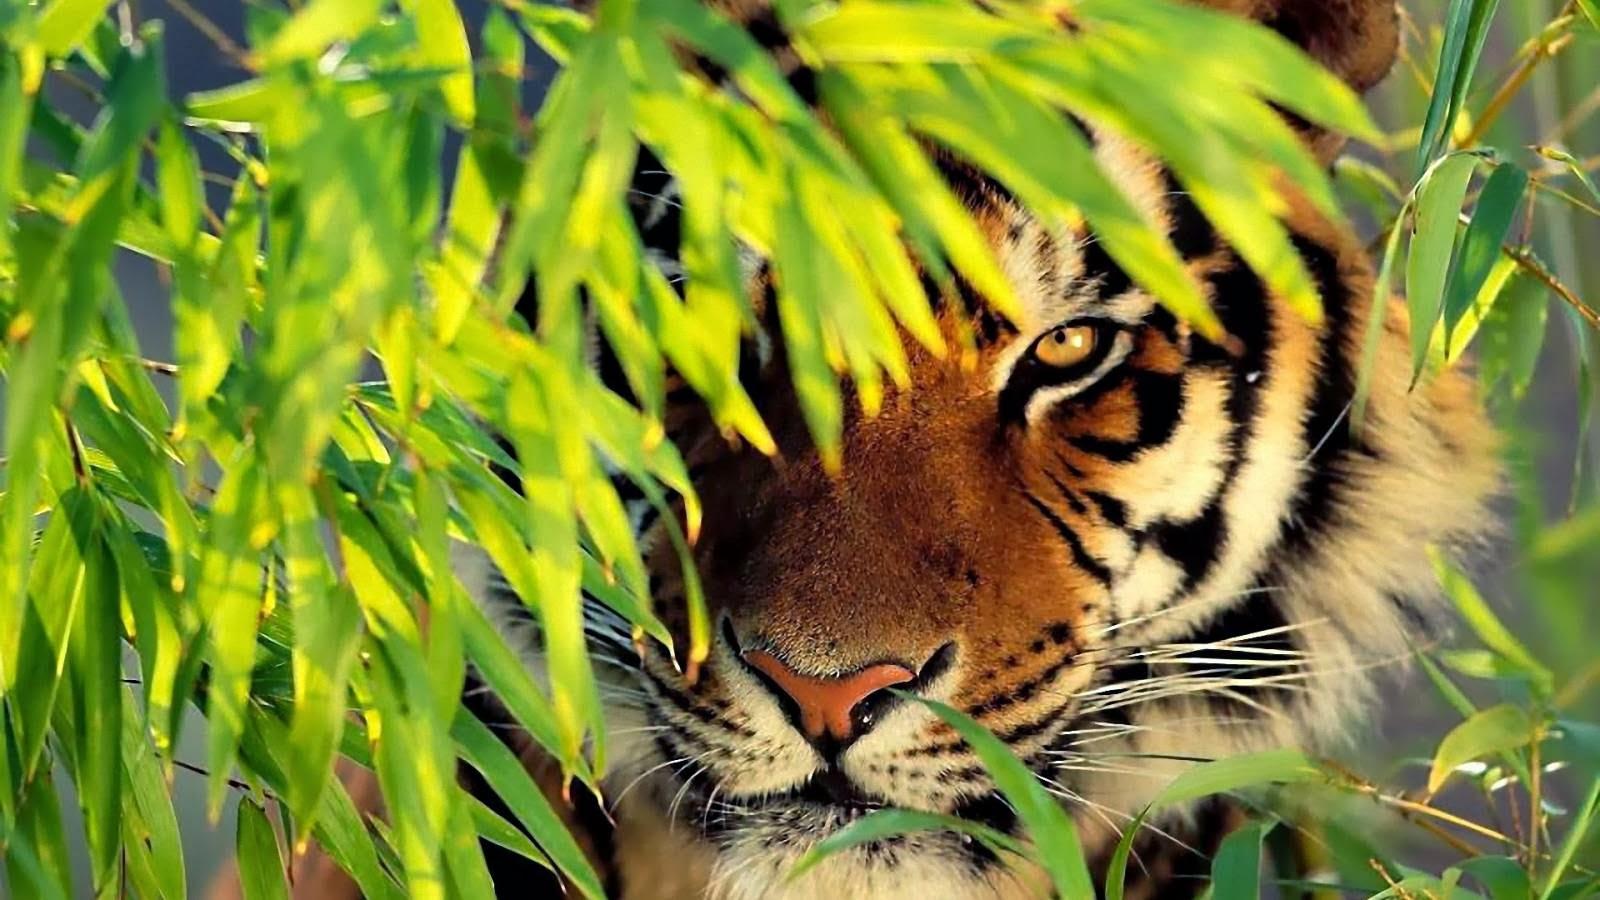 Tiger Hd Wallpapers: All New Wallpaper : Tiger Hd Wallpapers